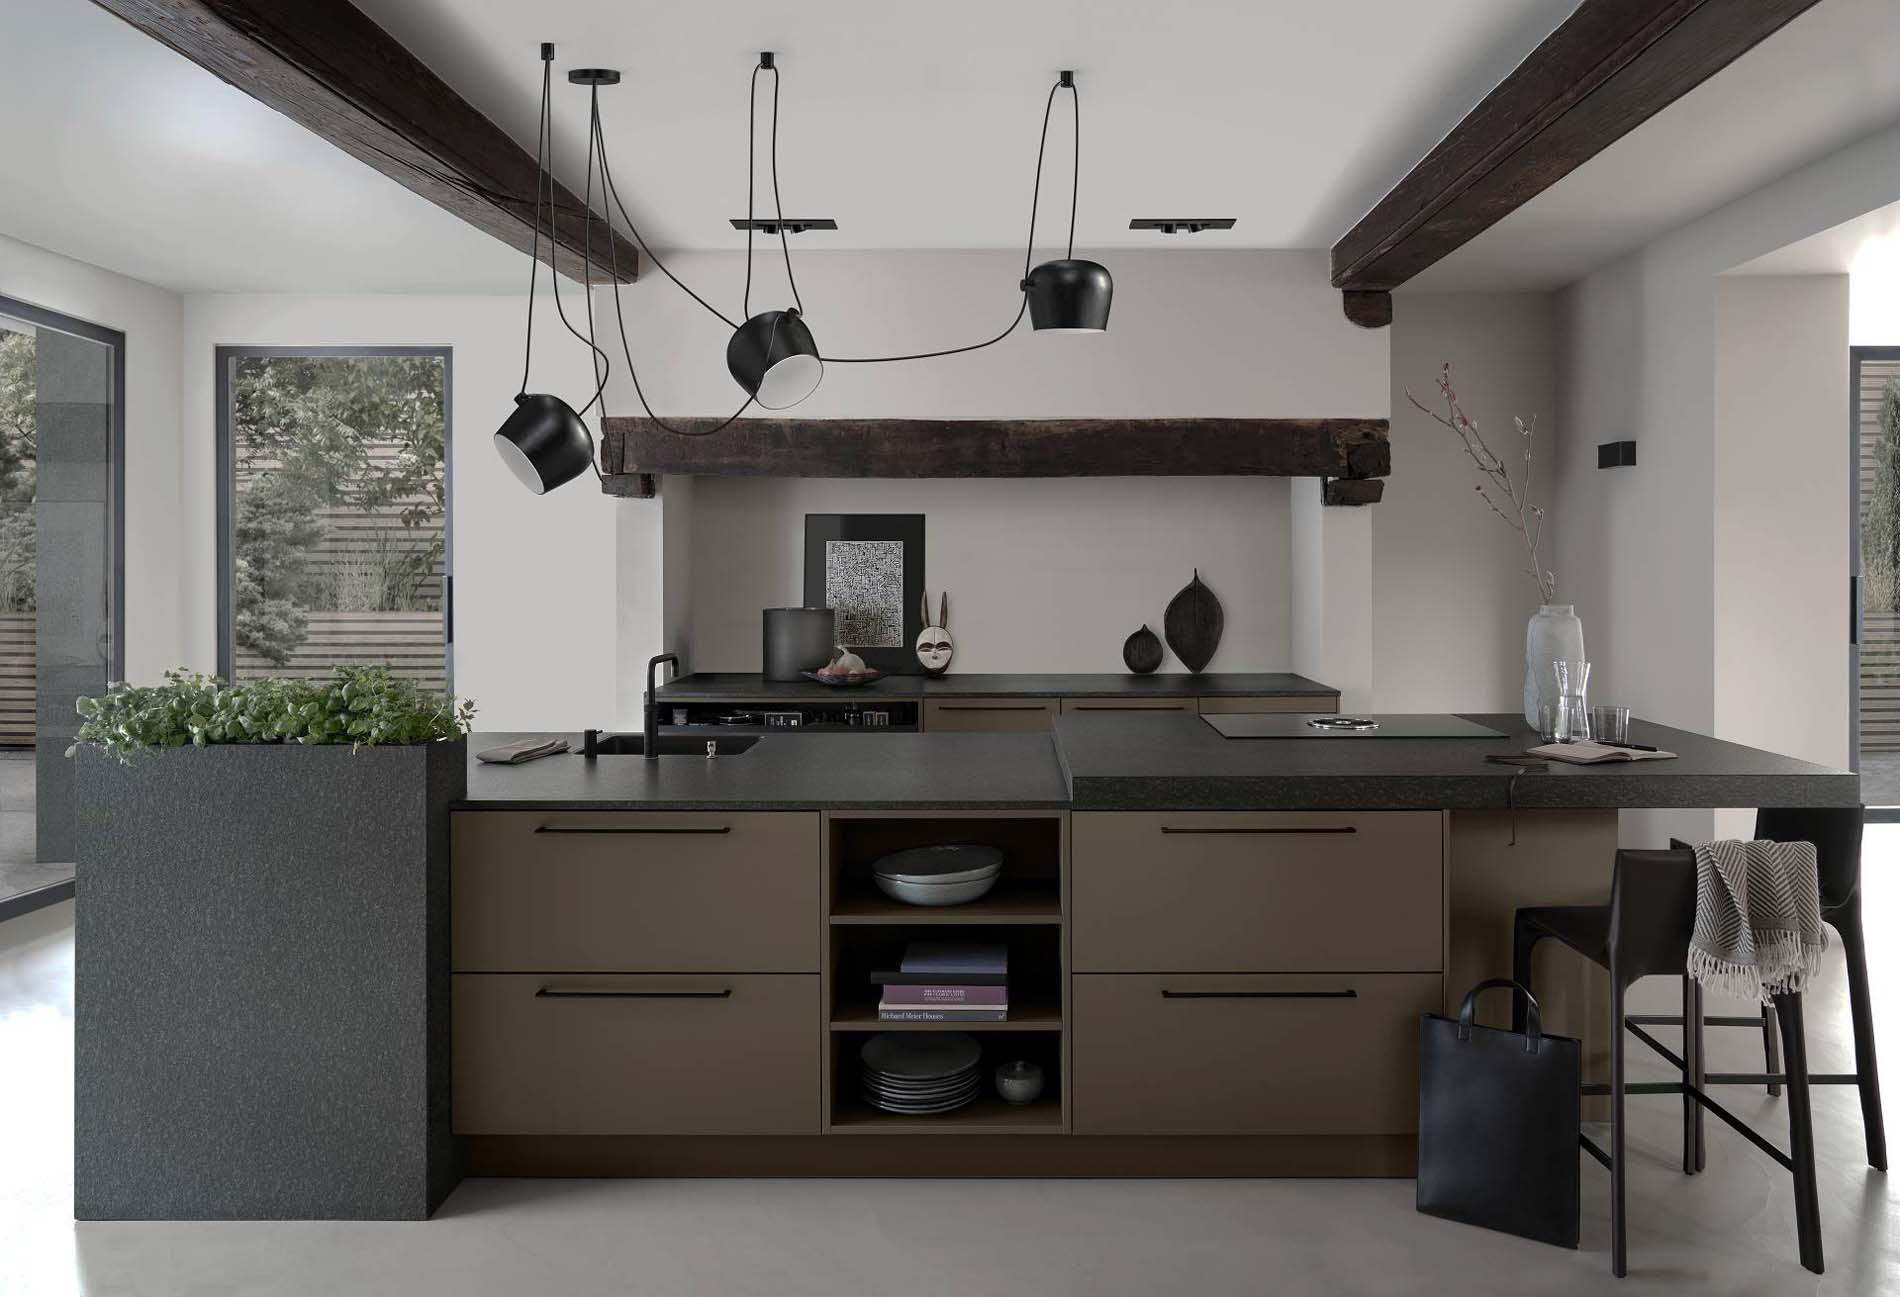 SieMatic Urbad keukeneiland met keukenblad Graniet, ASWA Keukens